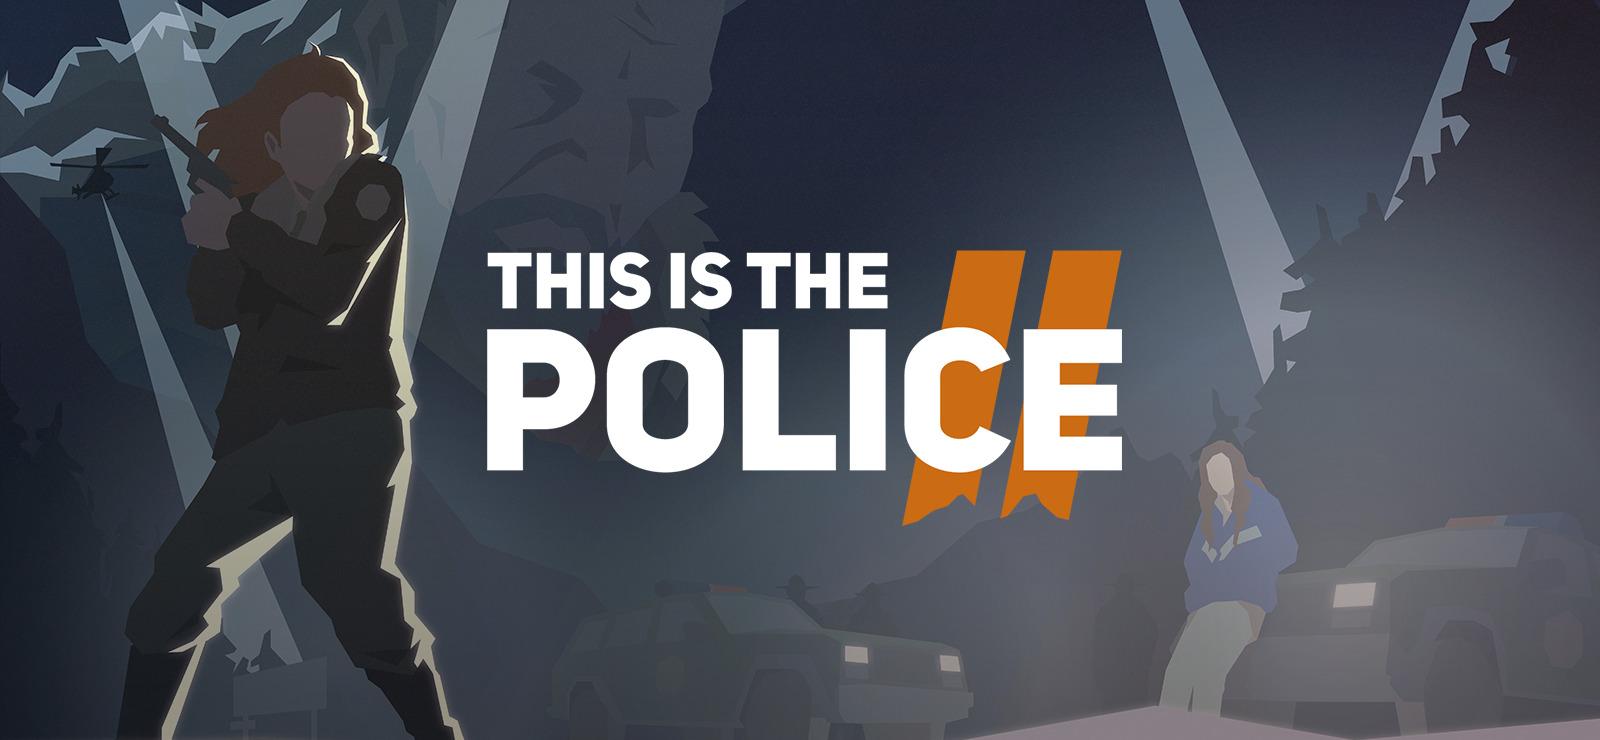 Прохождение This is the Police 2